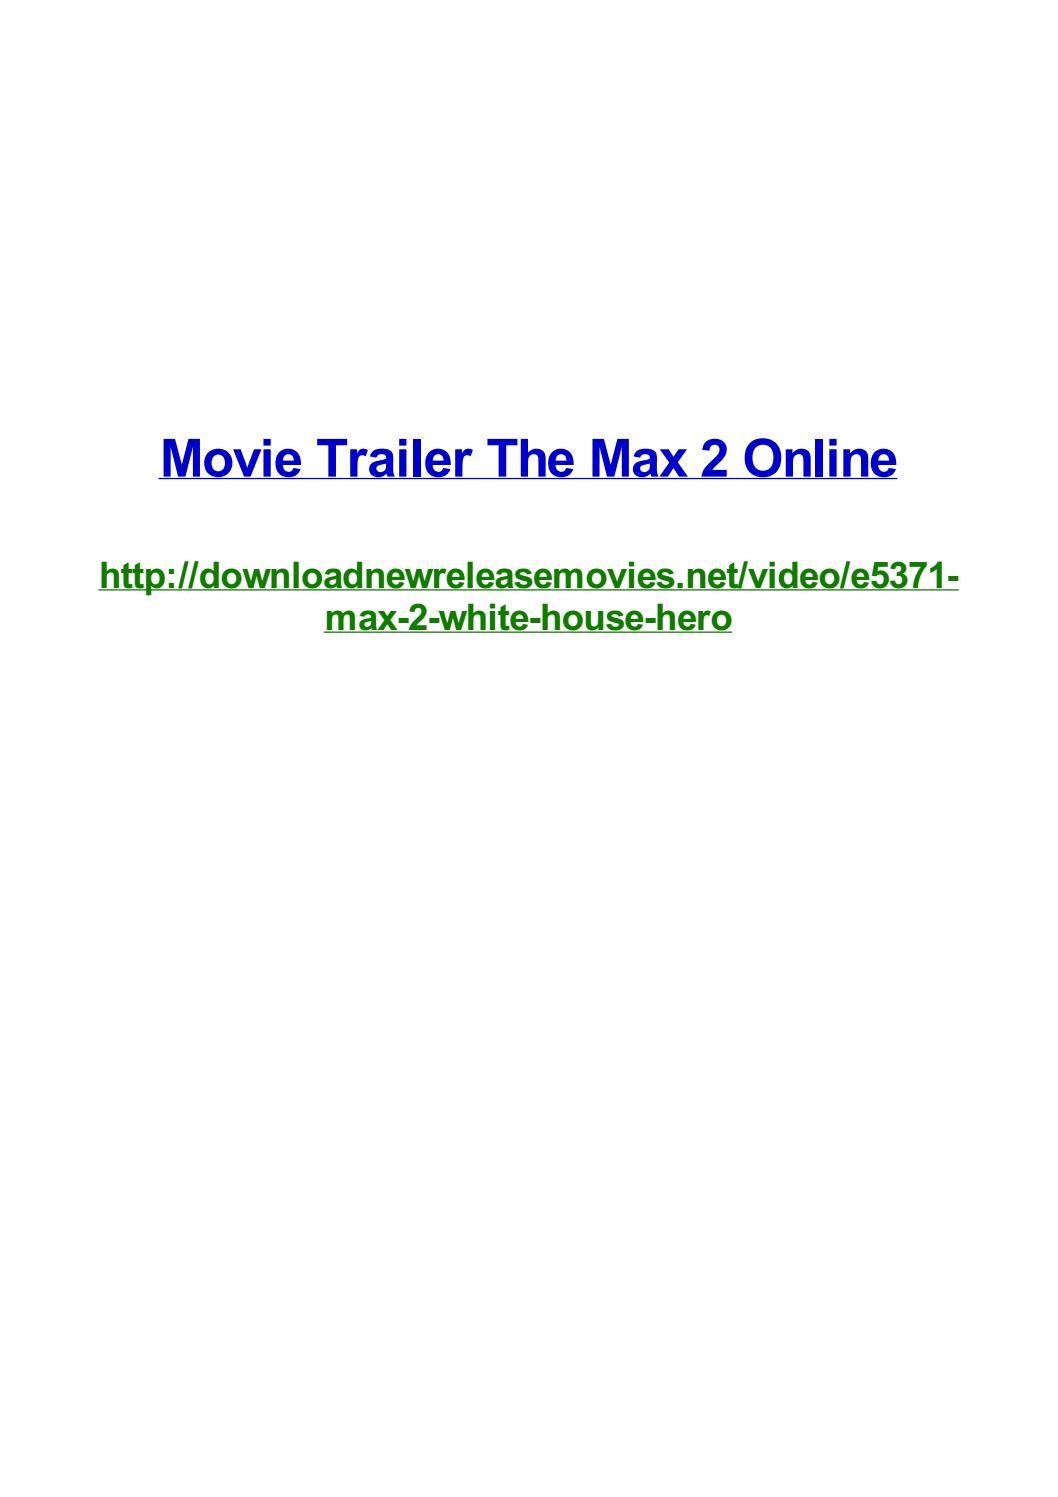 Jadwal Xxi Balekota : jadwal, balekota, Movie, Trailer, Online, Frank, Seamons, Issuu